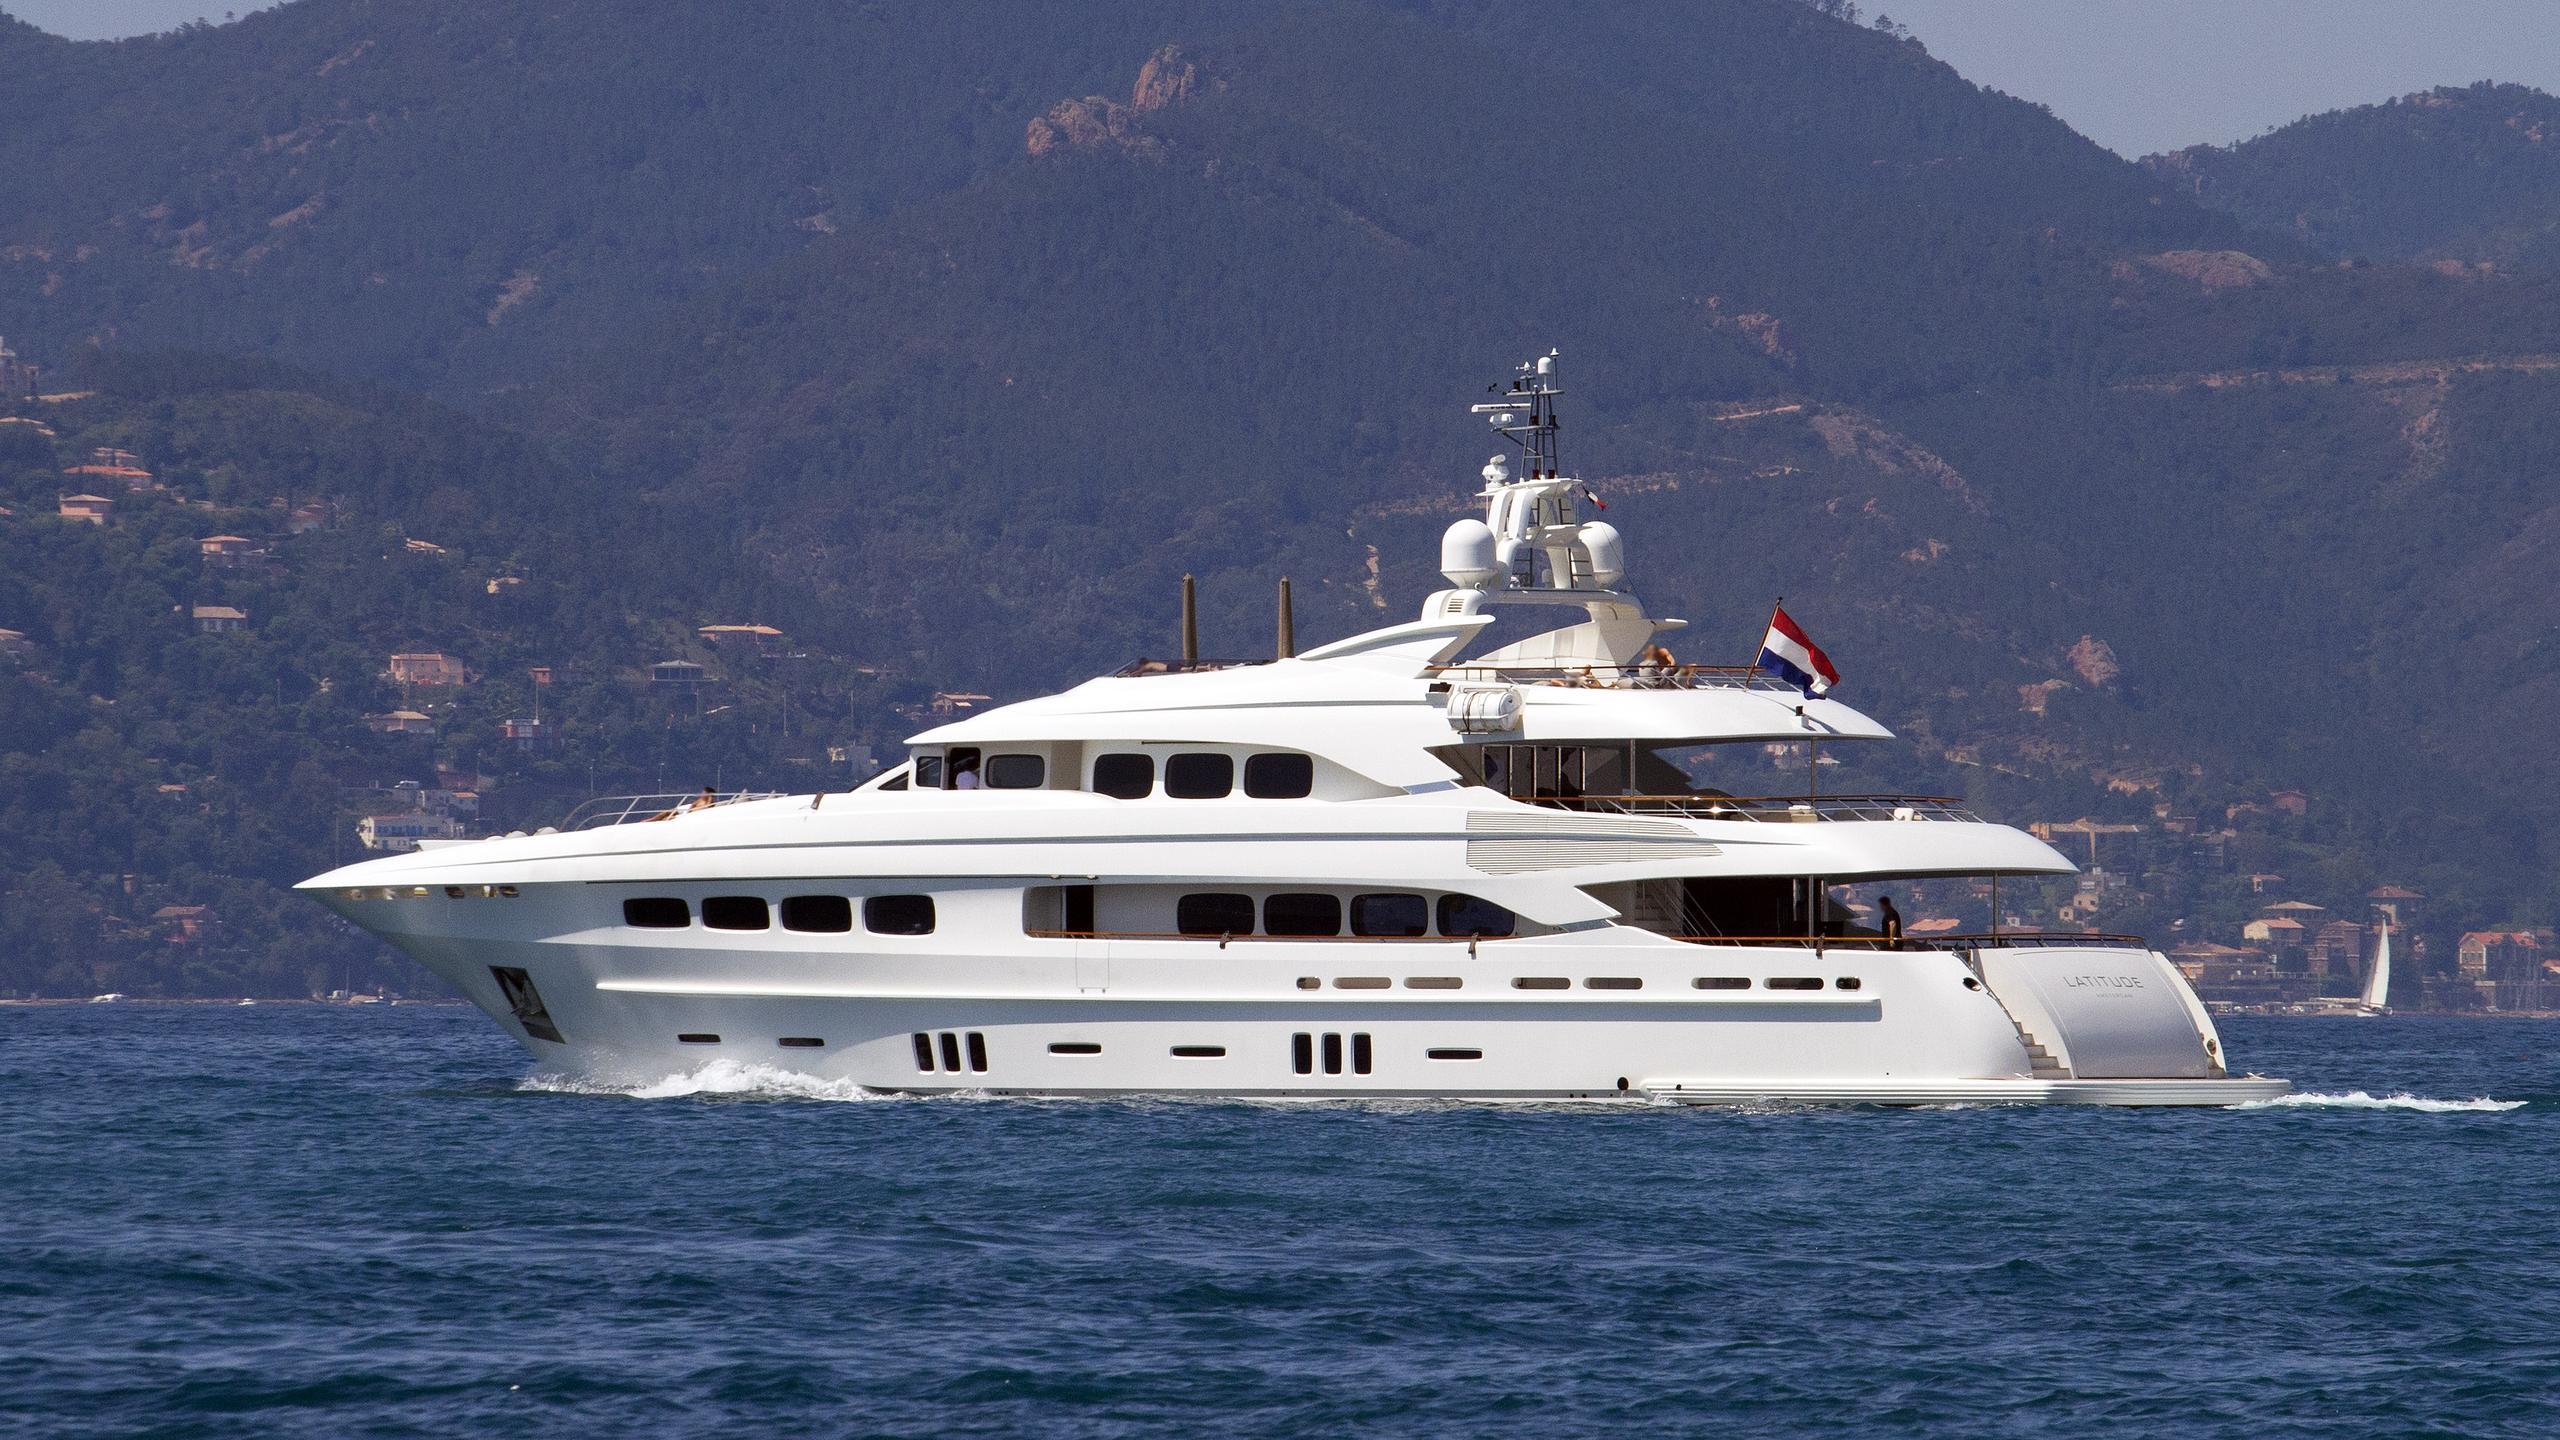 latitude-motor-yacht-dutch-yacht-buliders-2010-43m-cruising-half-profile